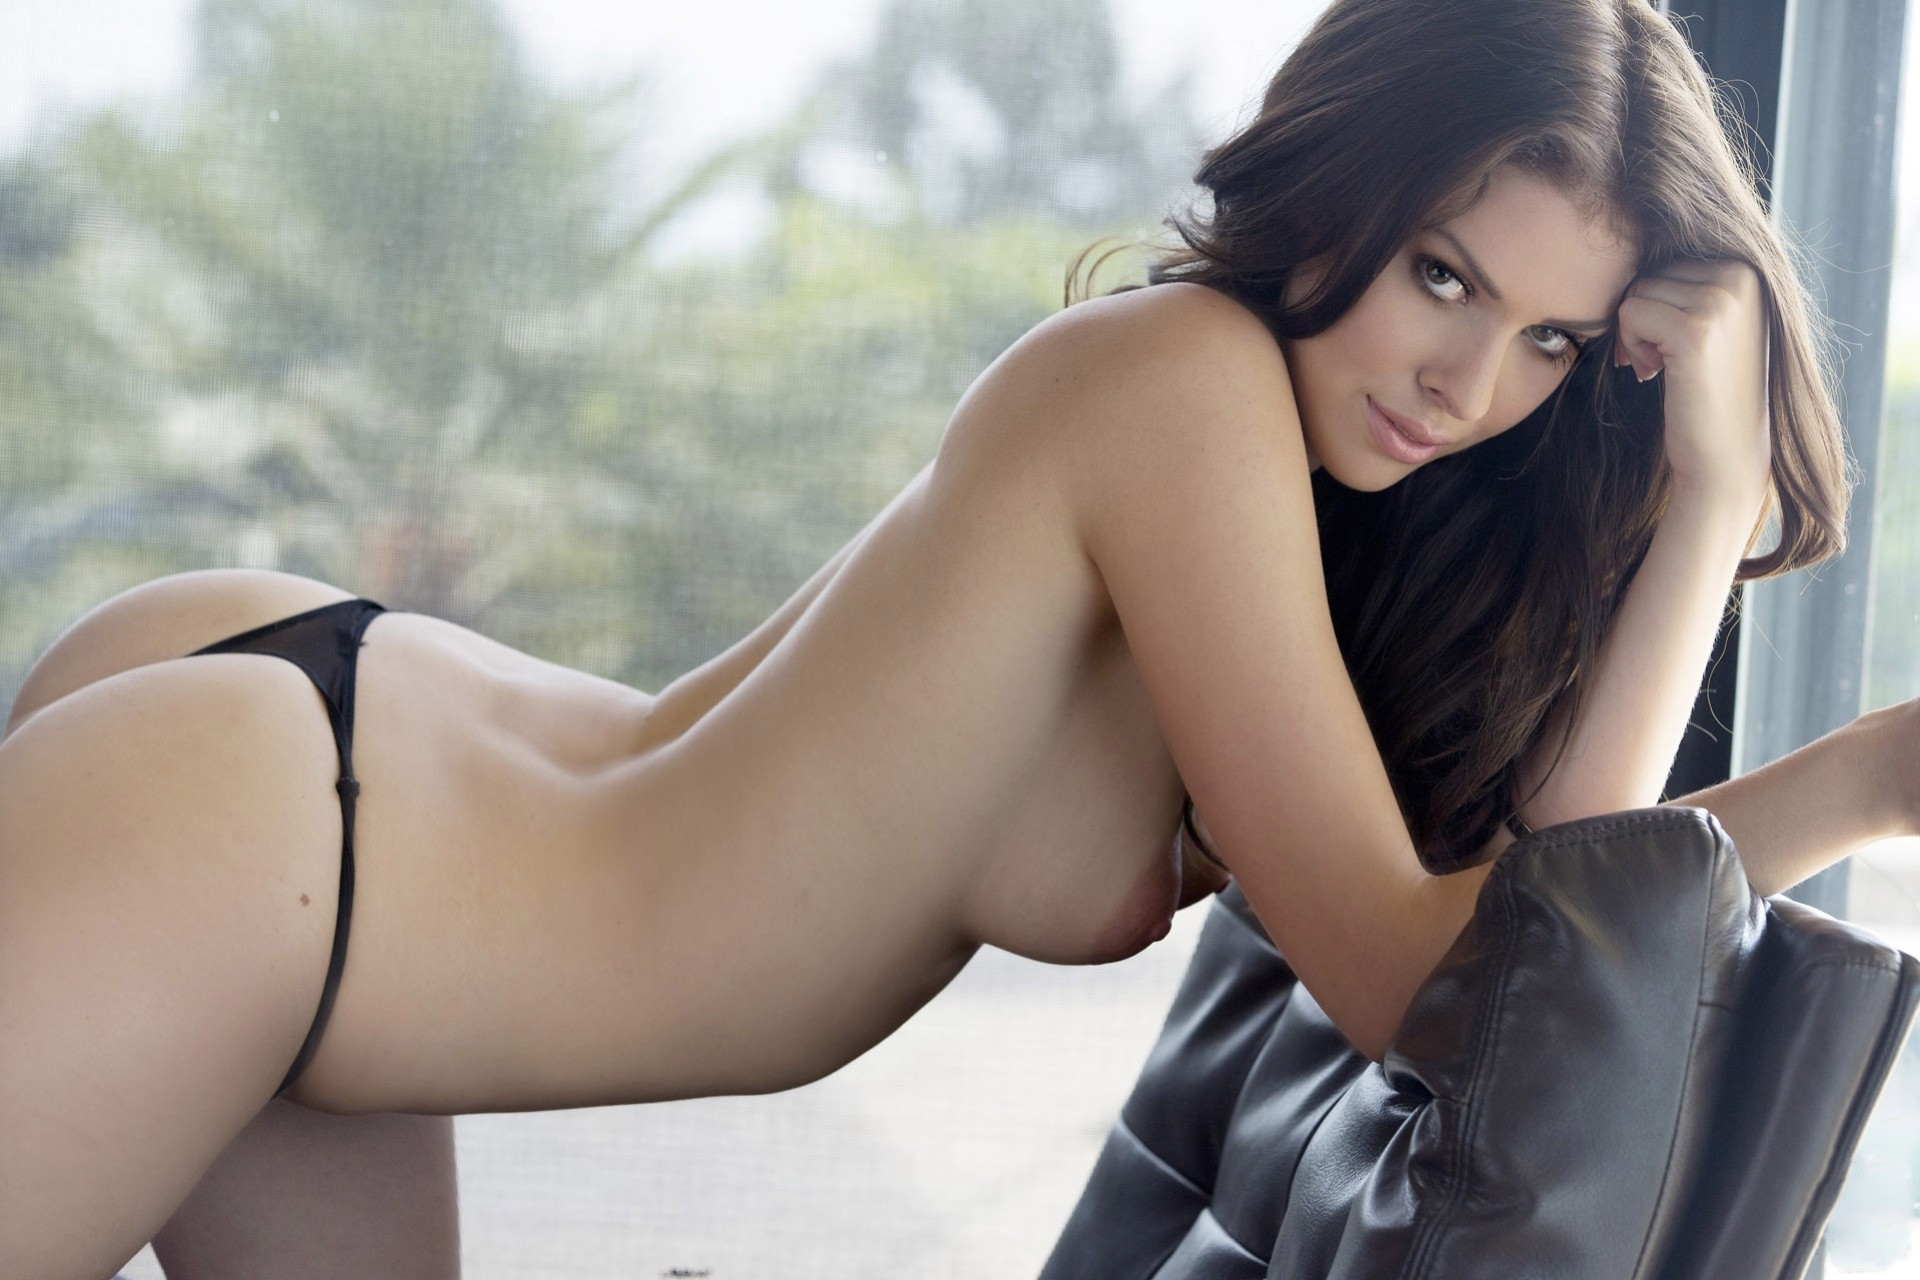 Sexiest sex videos ever